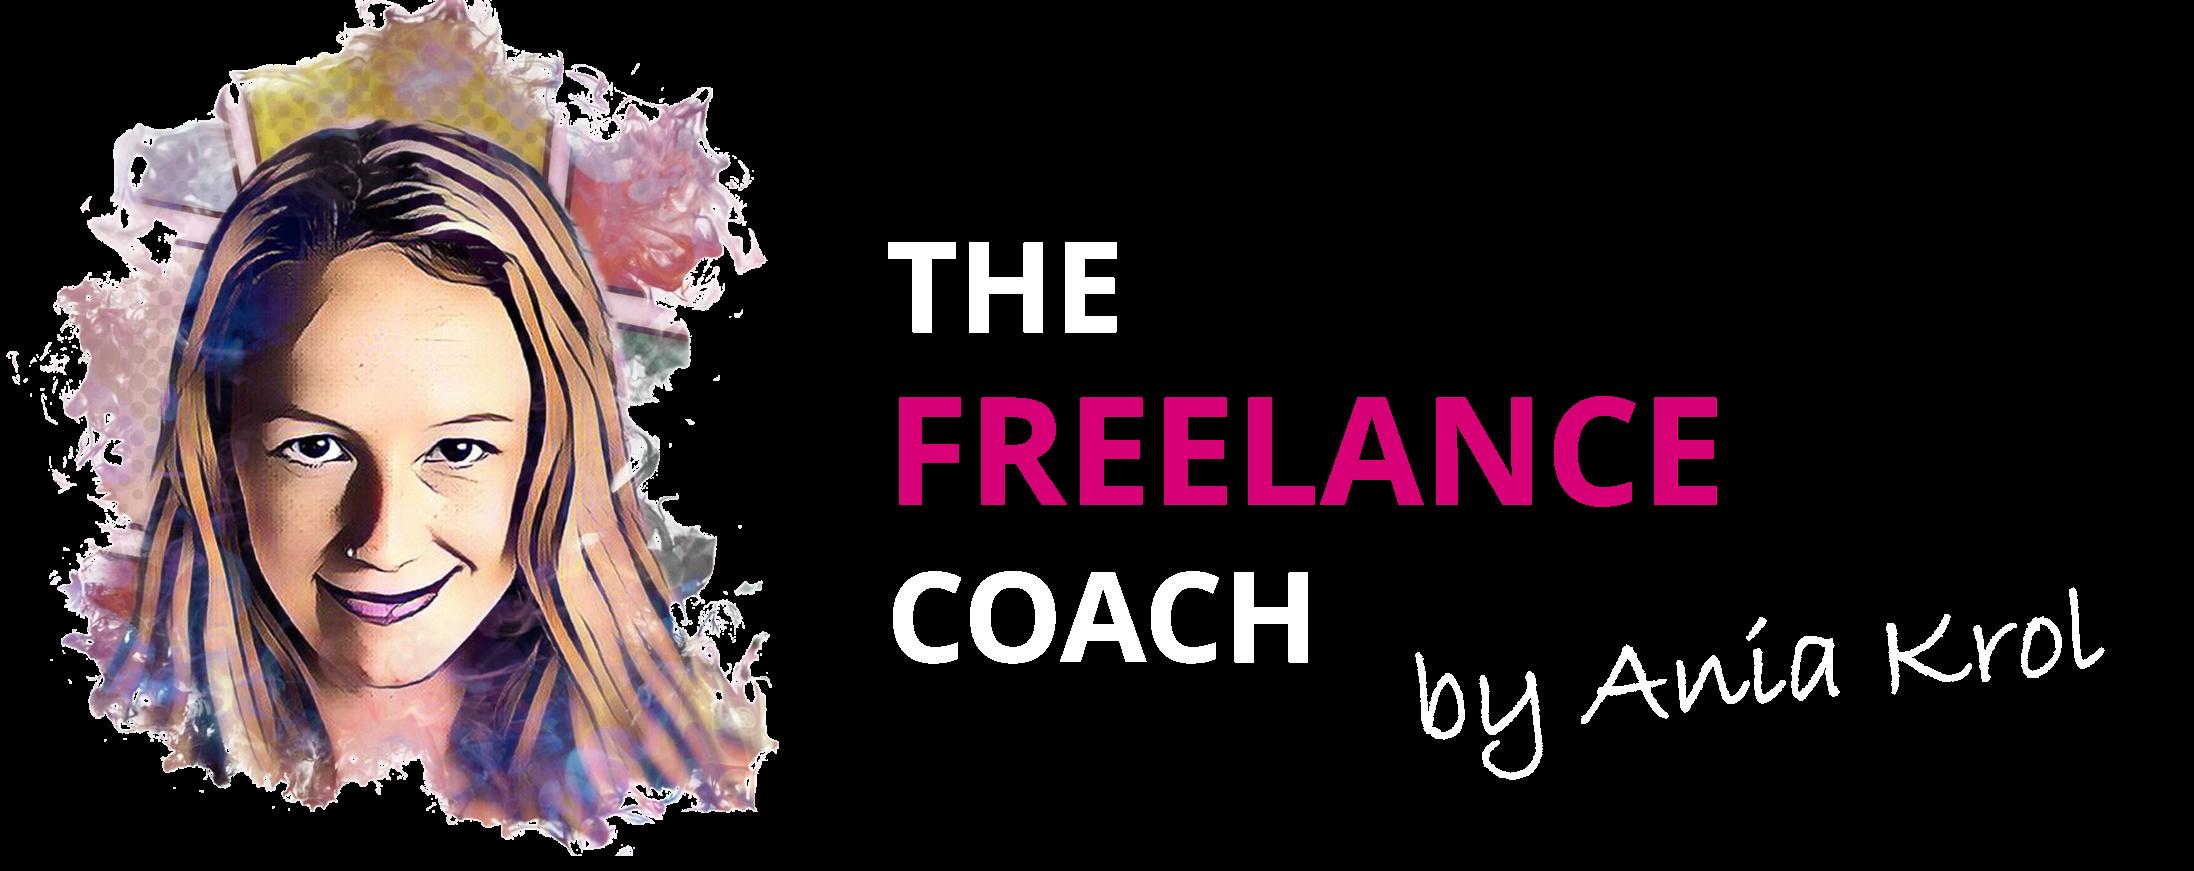 The Freelance Coach